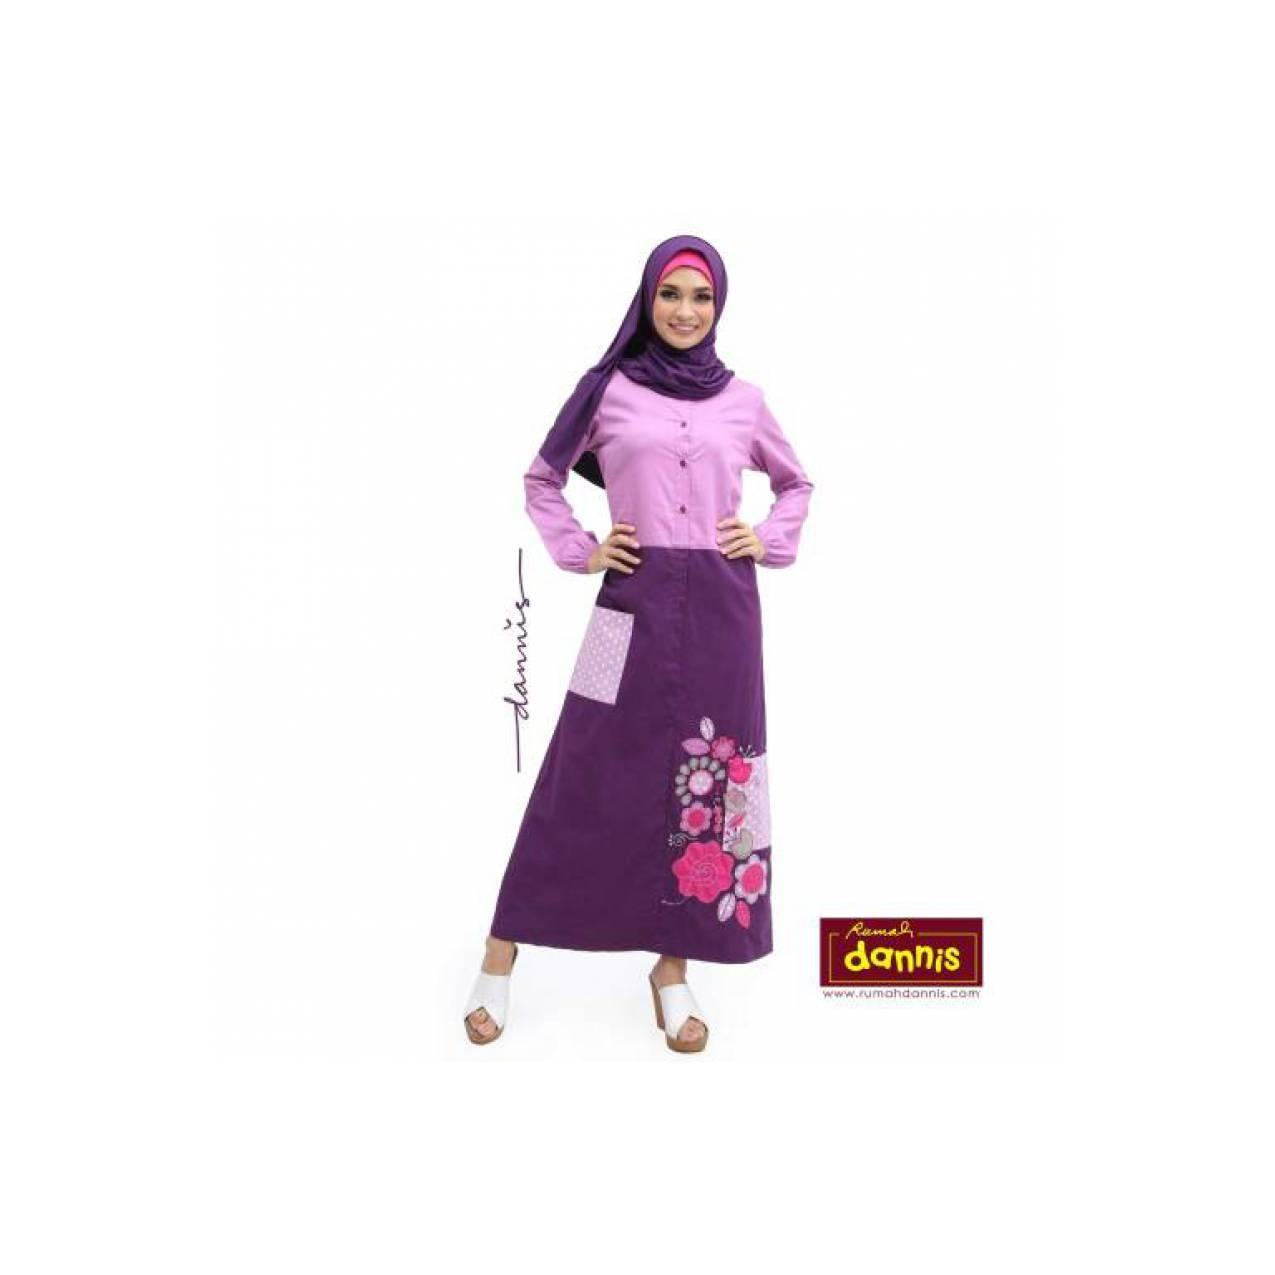 Abaya Dannis Size XL